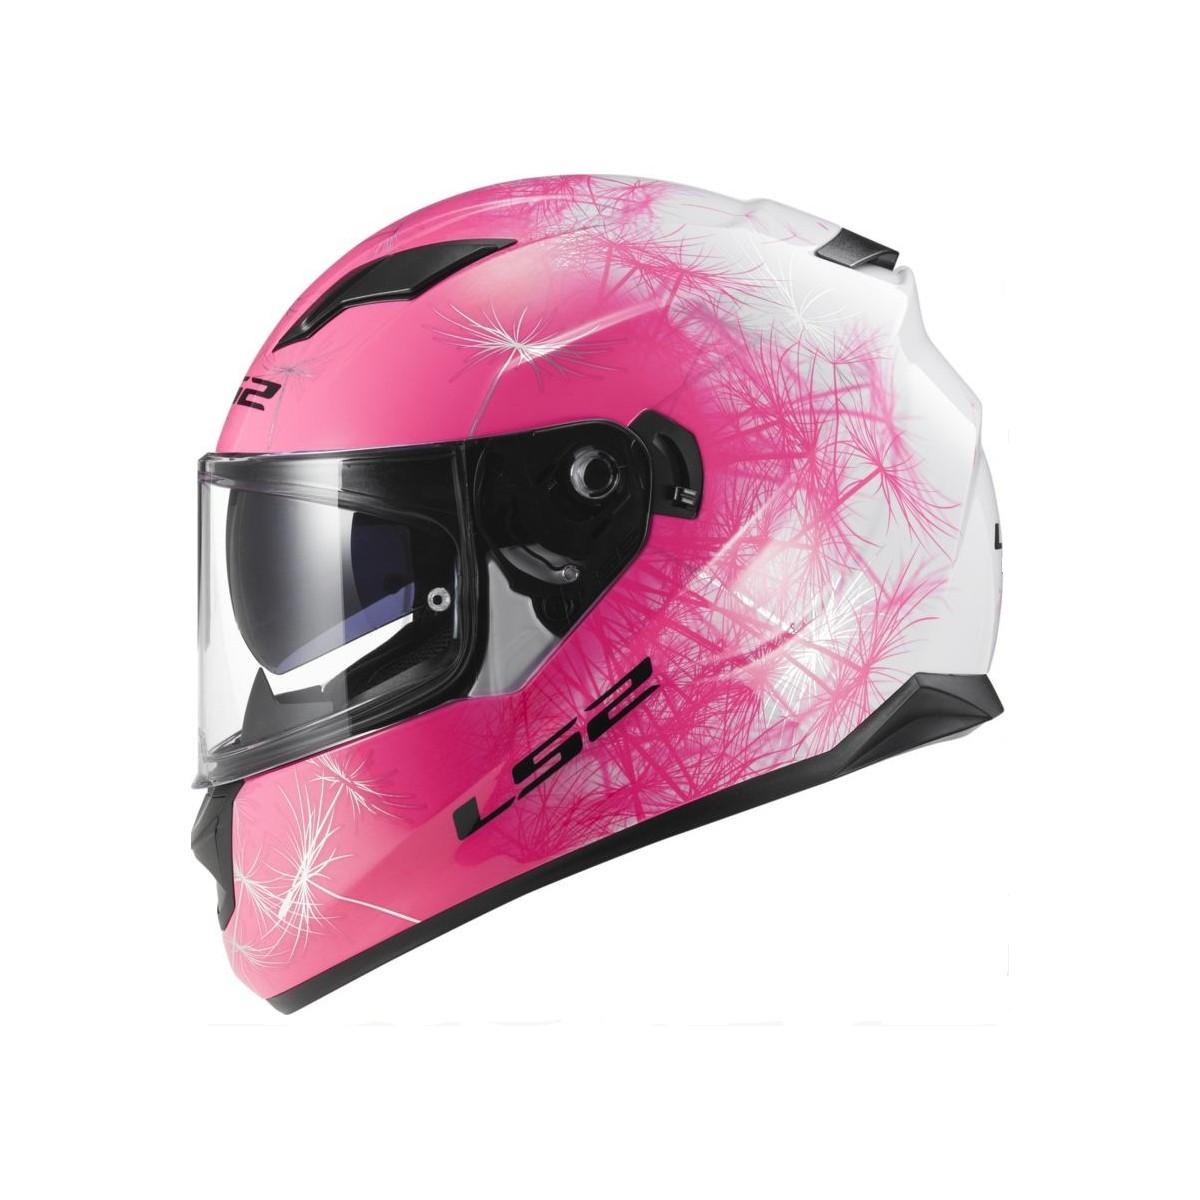 Casco Ls2 Ff320 Stream Wind Blanco Rosa Compra Online